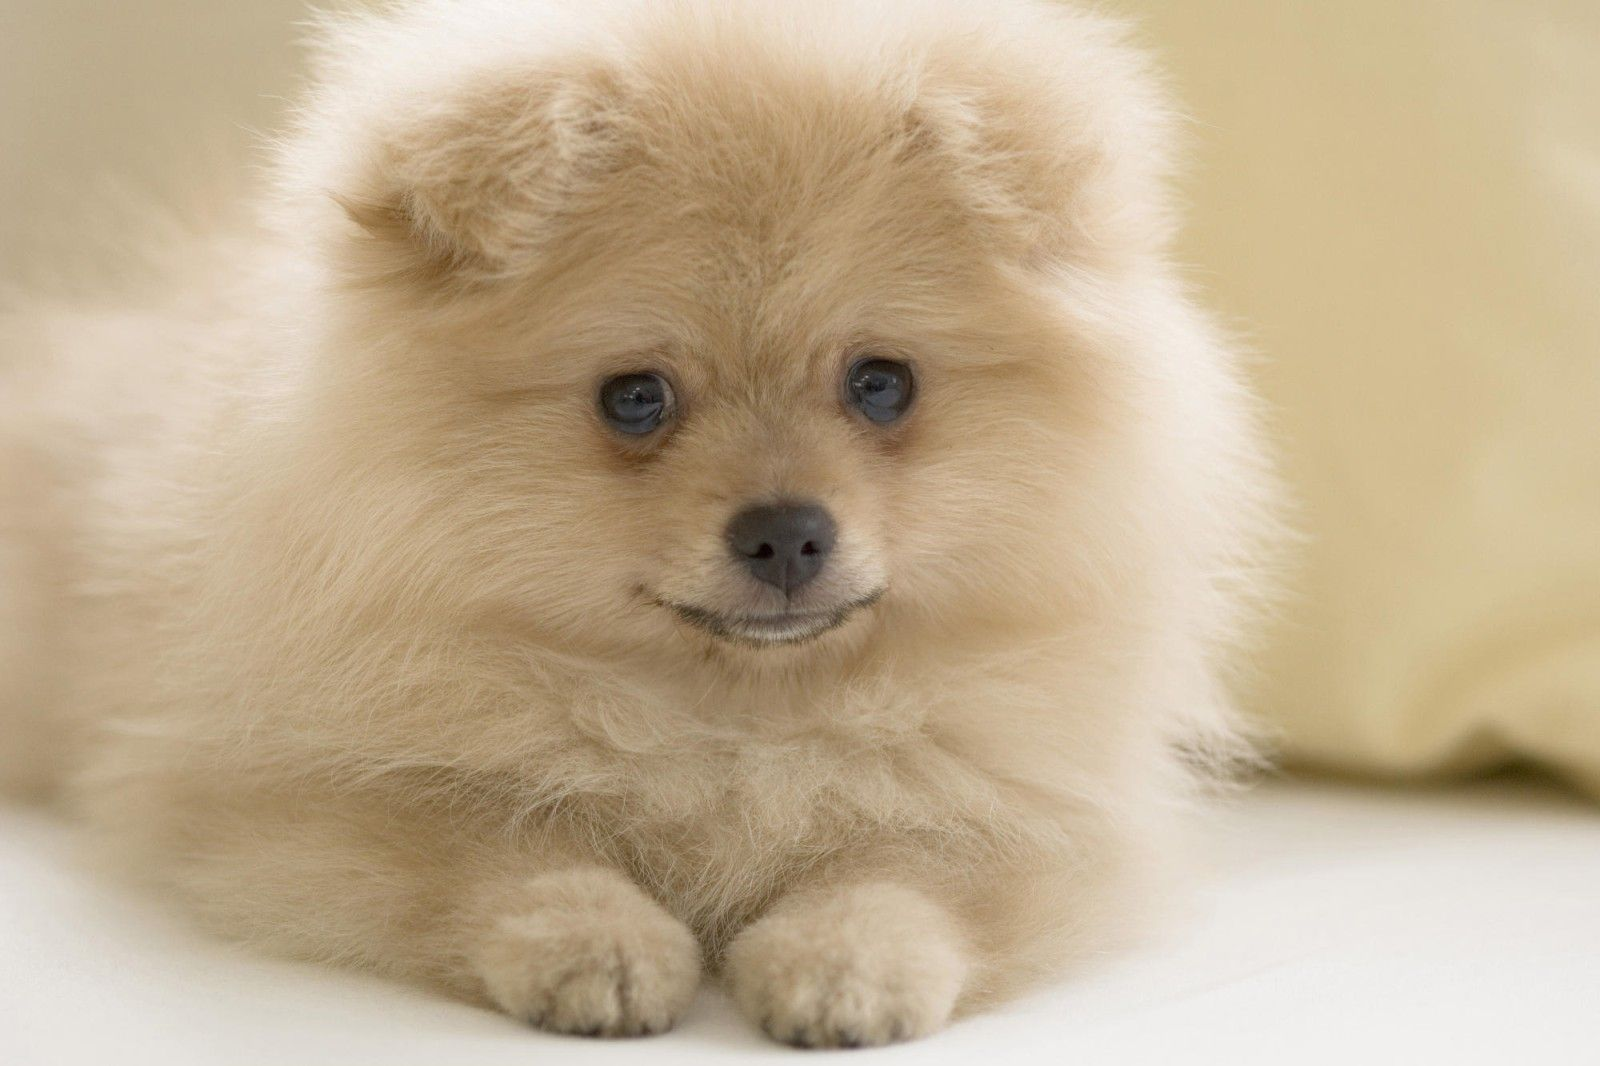 Pomeranian Sheepdog Photo Pomeranian Puppy Pictures Pomeranian